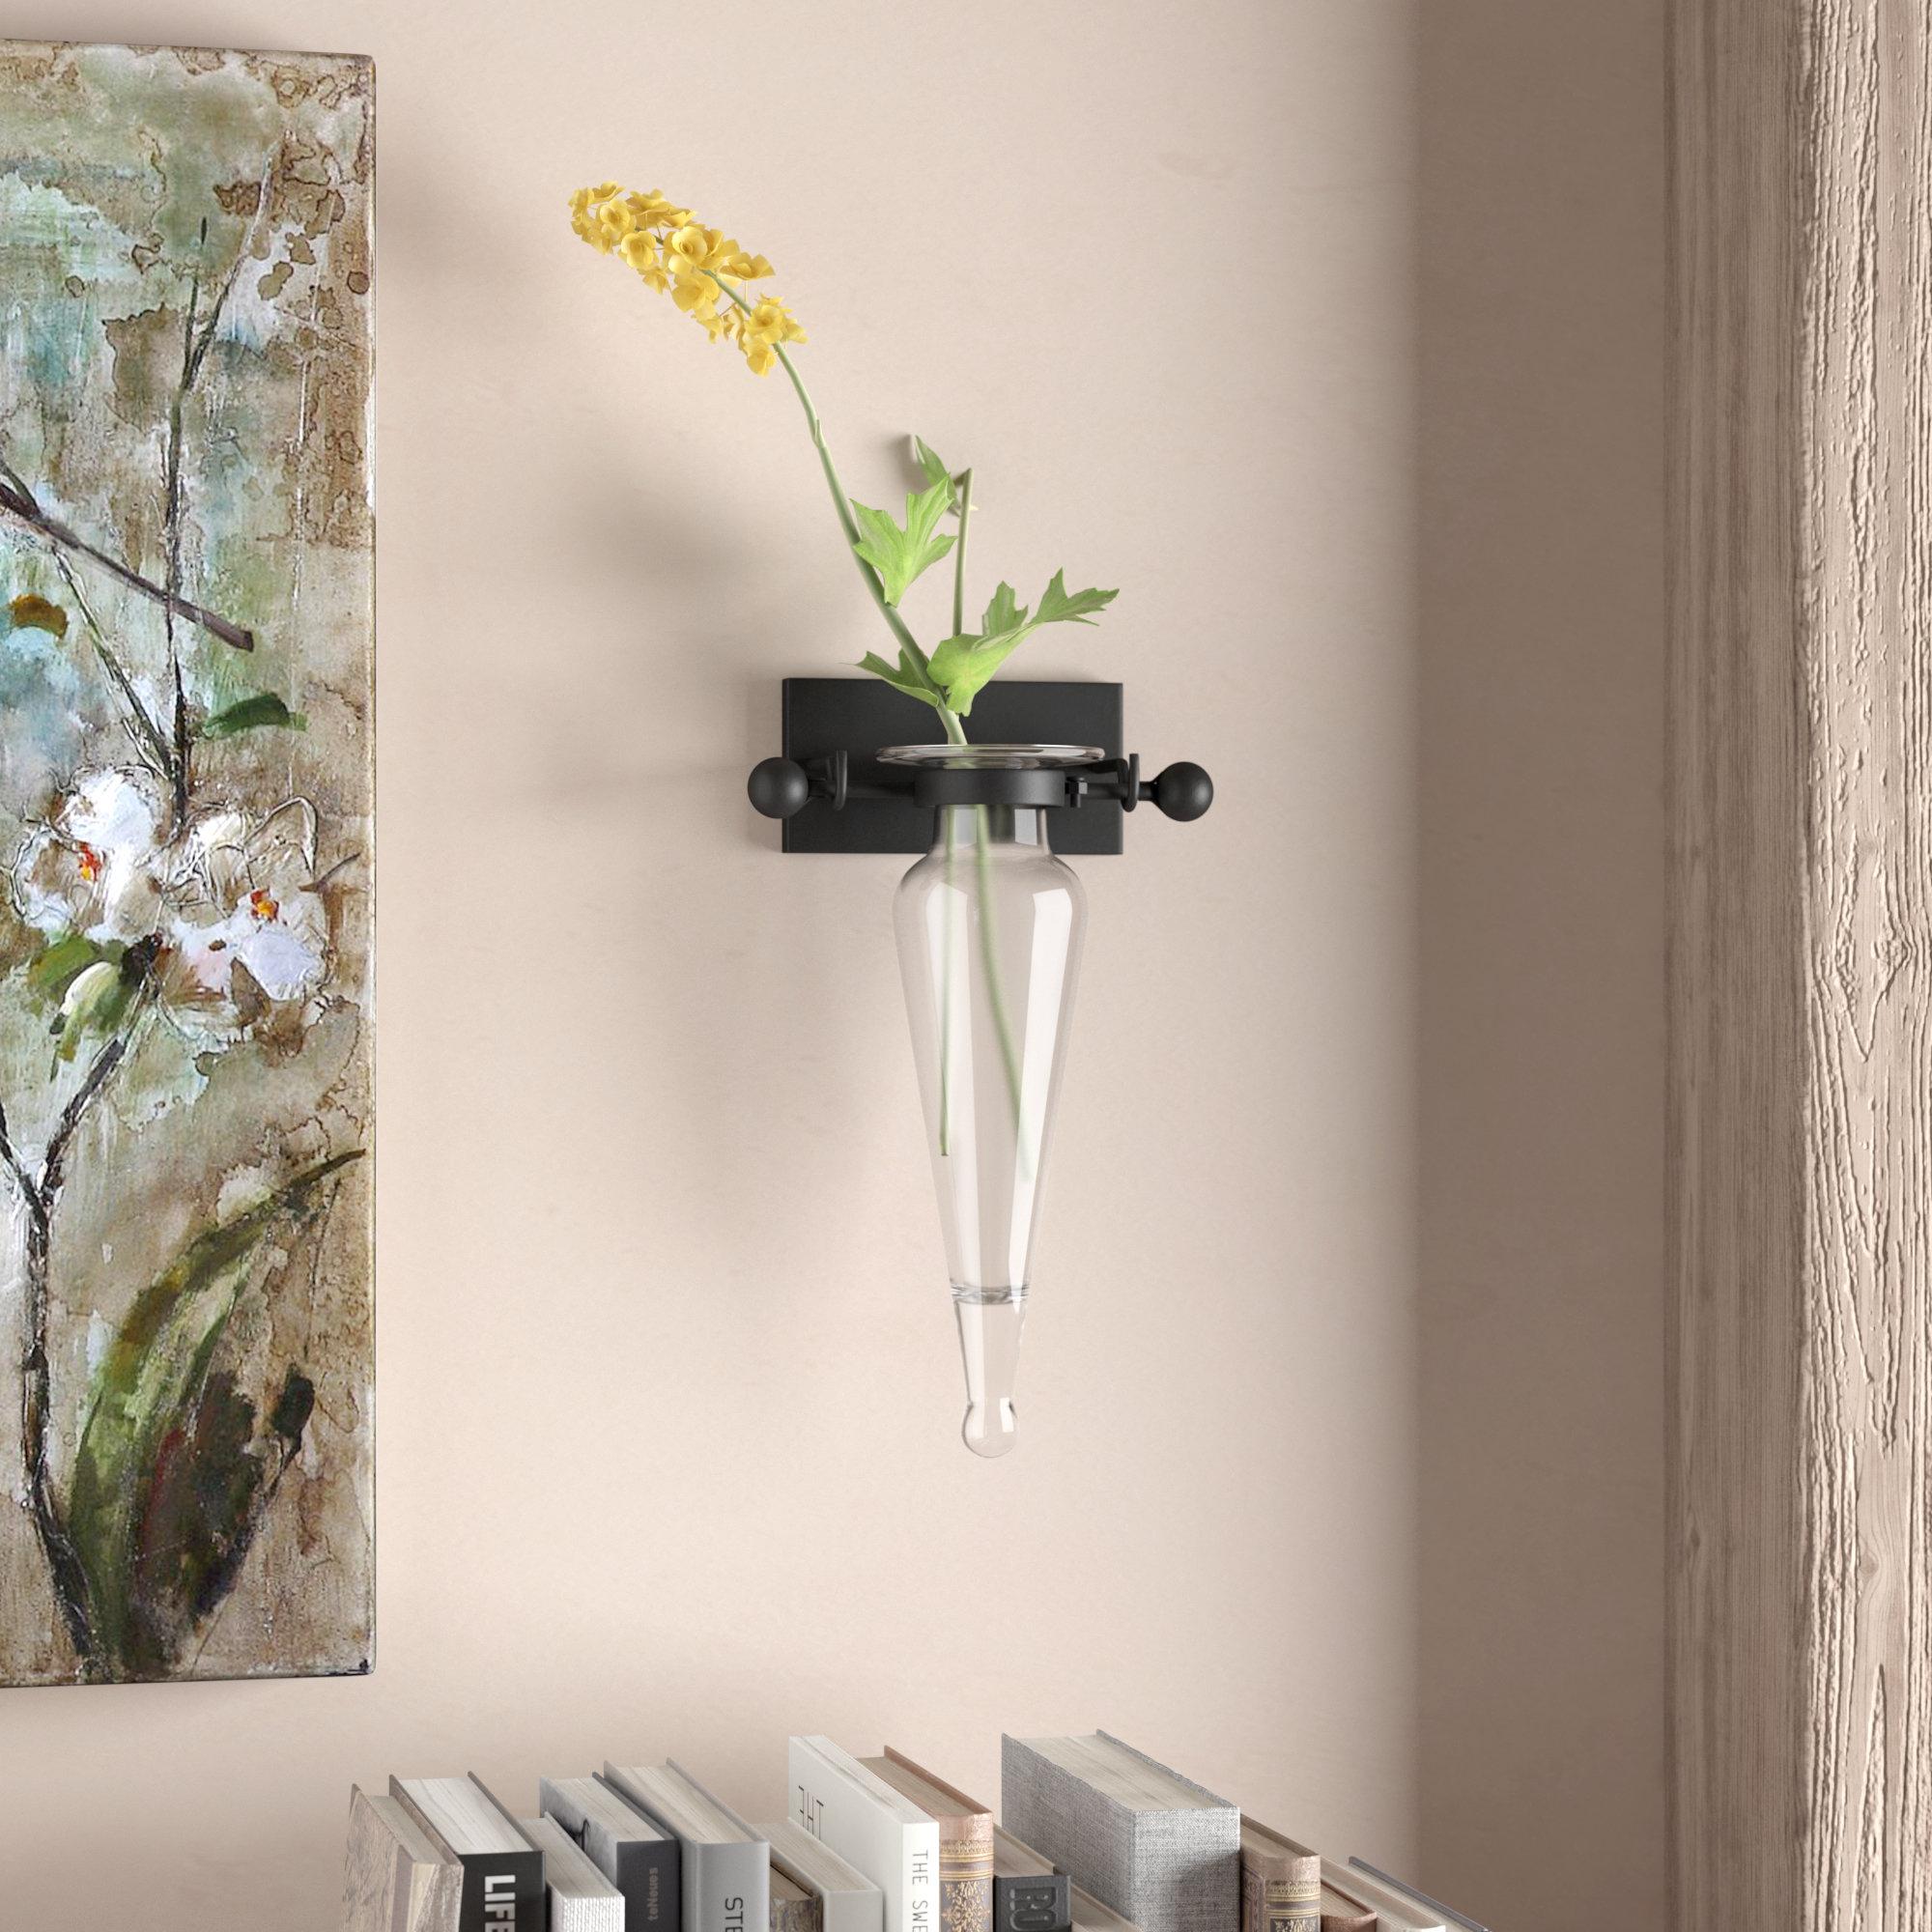 Vase And Bowl Wall Decor | Wayfair Regarding Vase And Bowl Wall Decor By Alcott Hill (View 5 of 30)